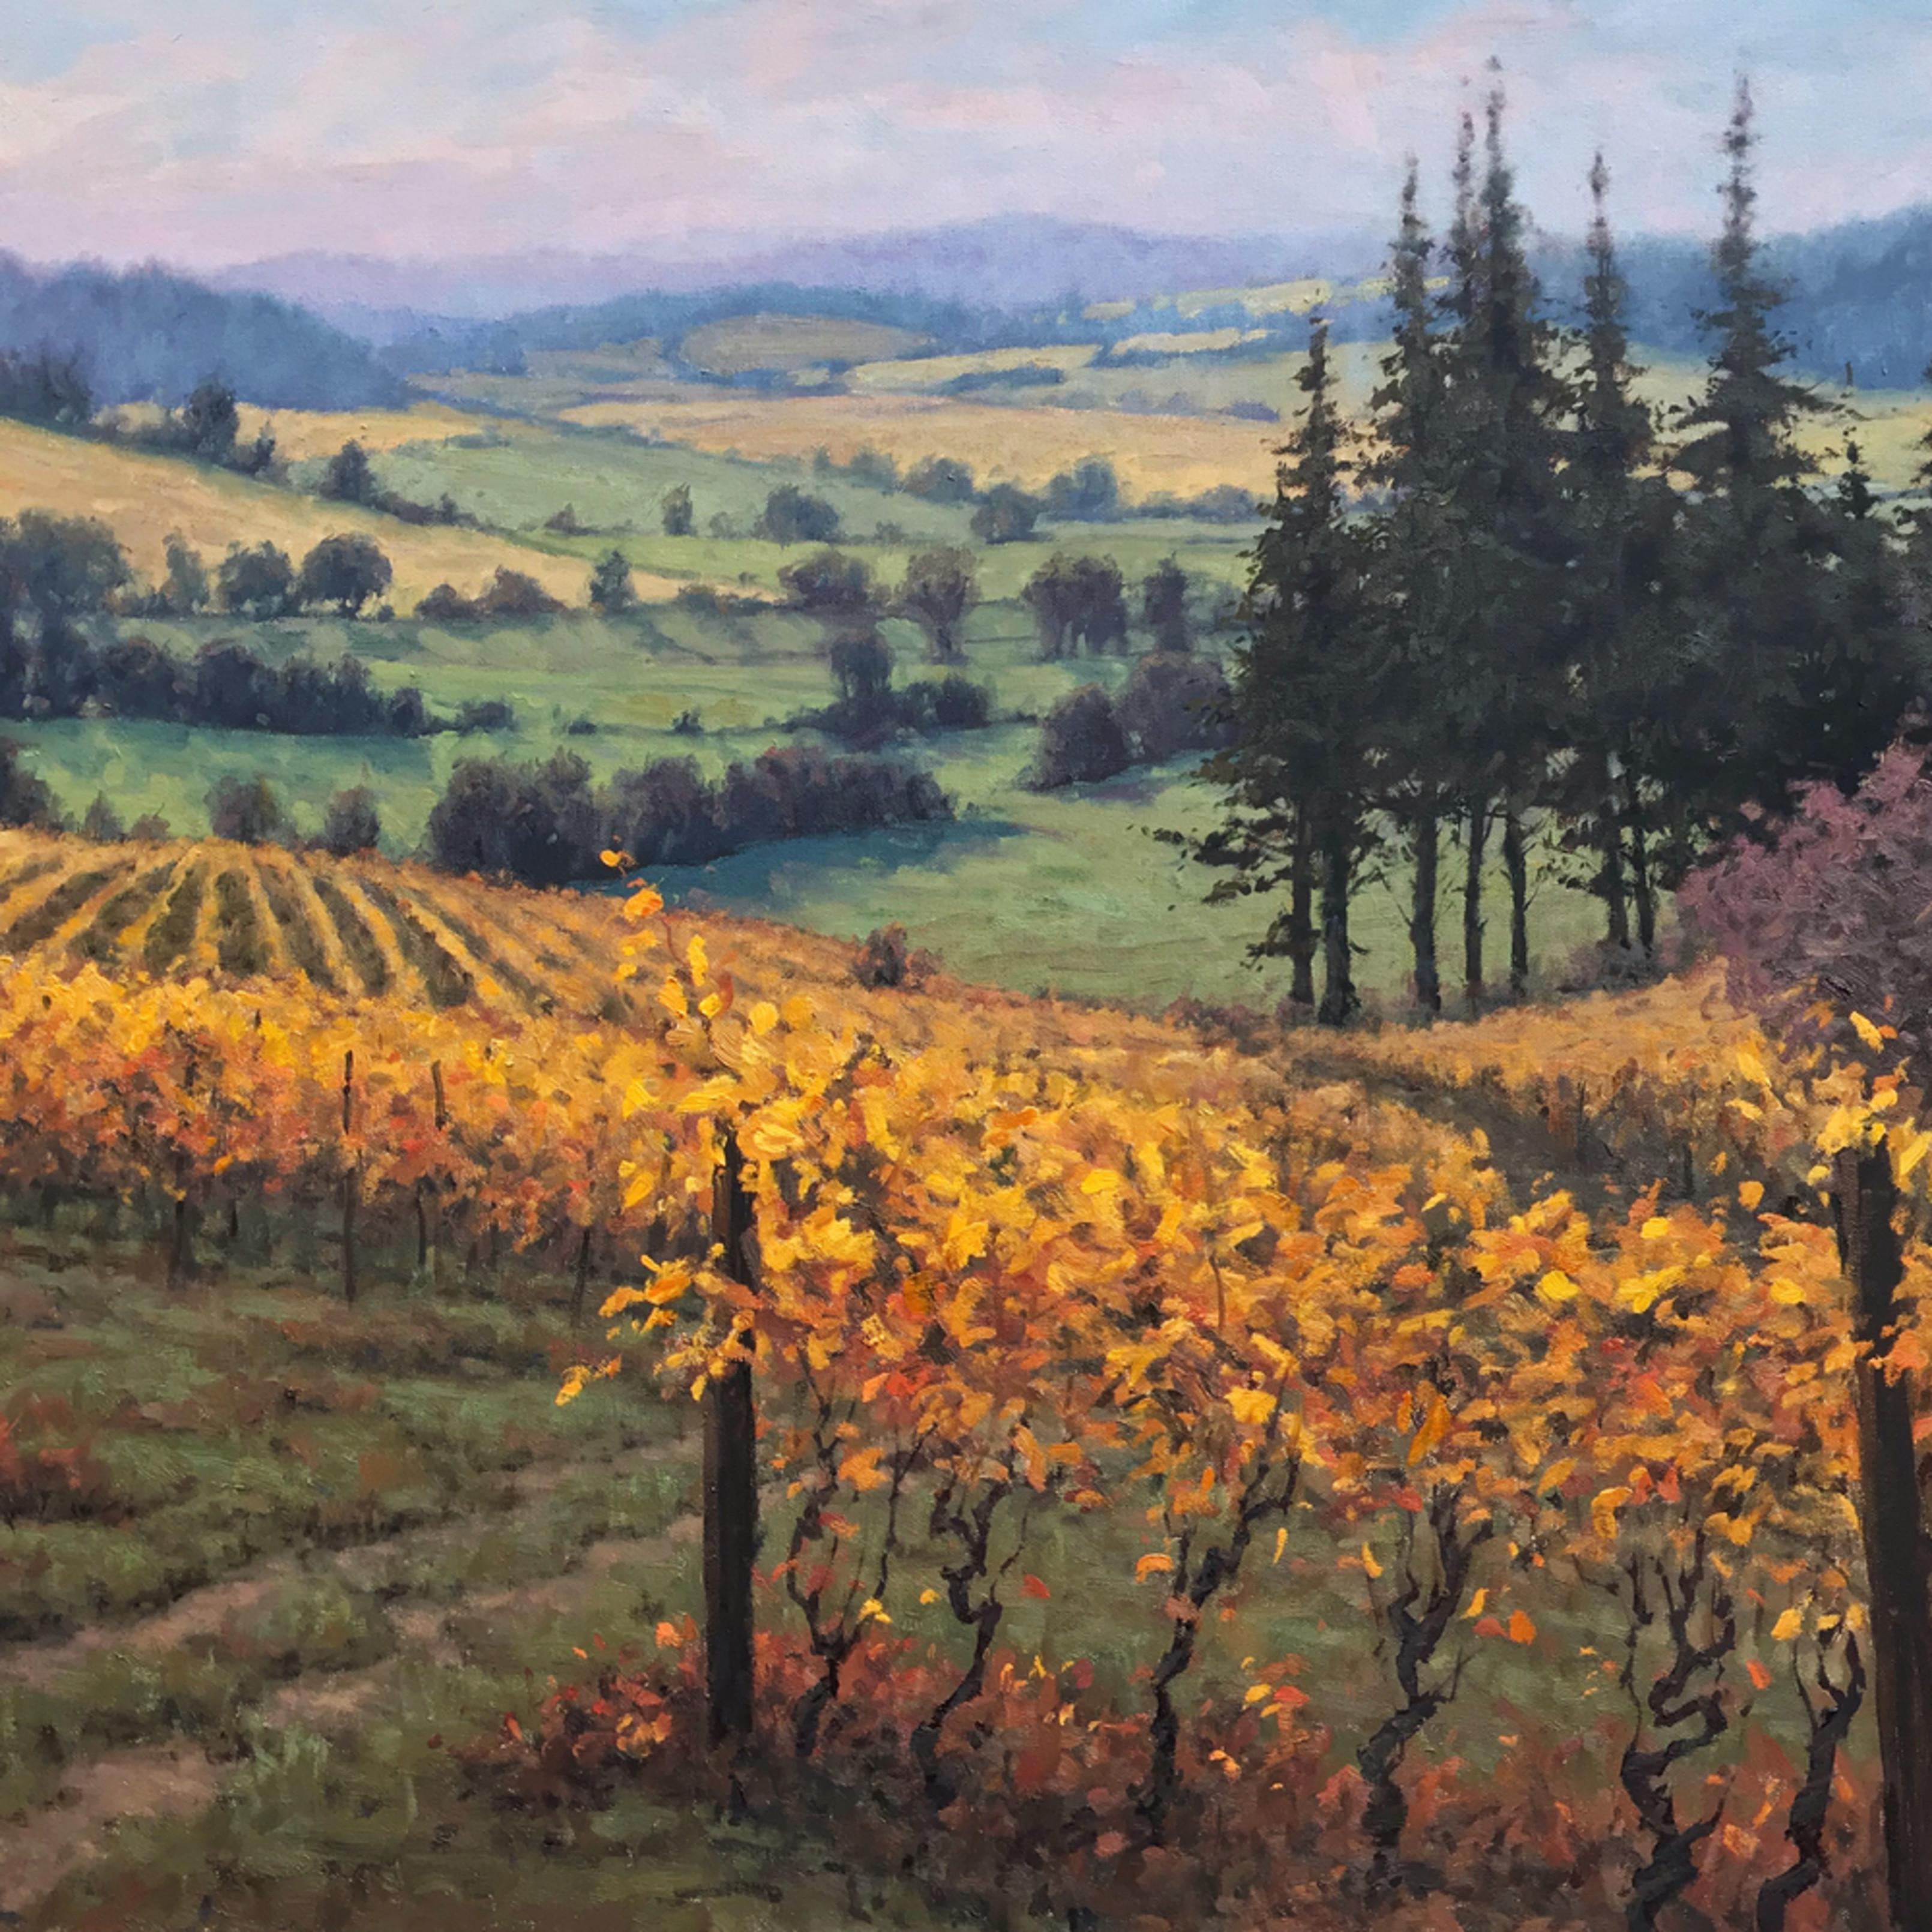 2 2020 vineyardsrest 30x40 oils michaelorwick large jvpnfu